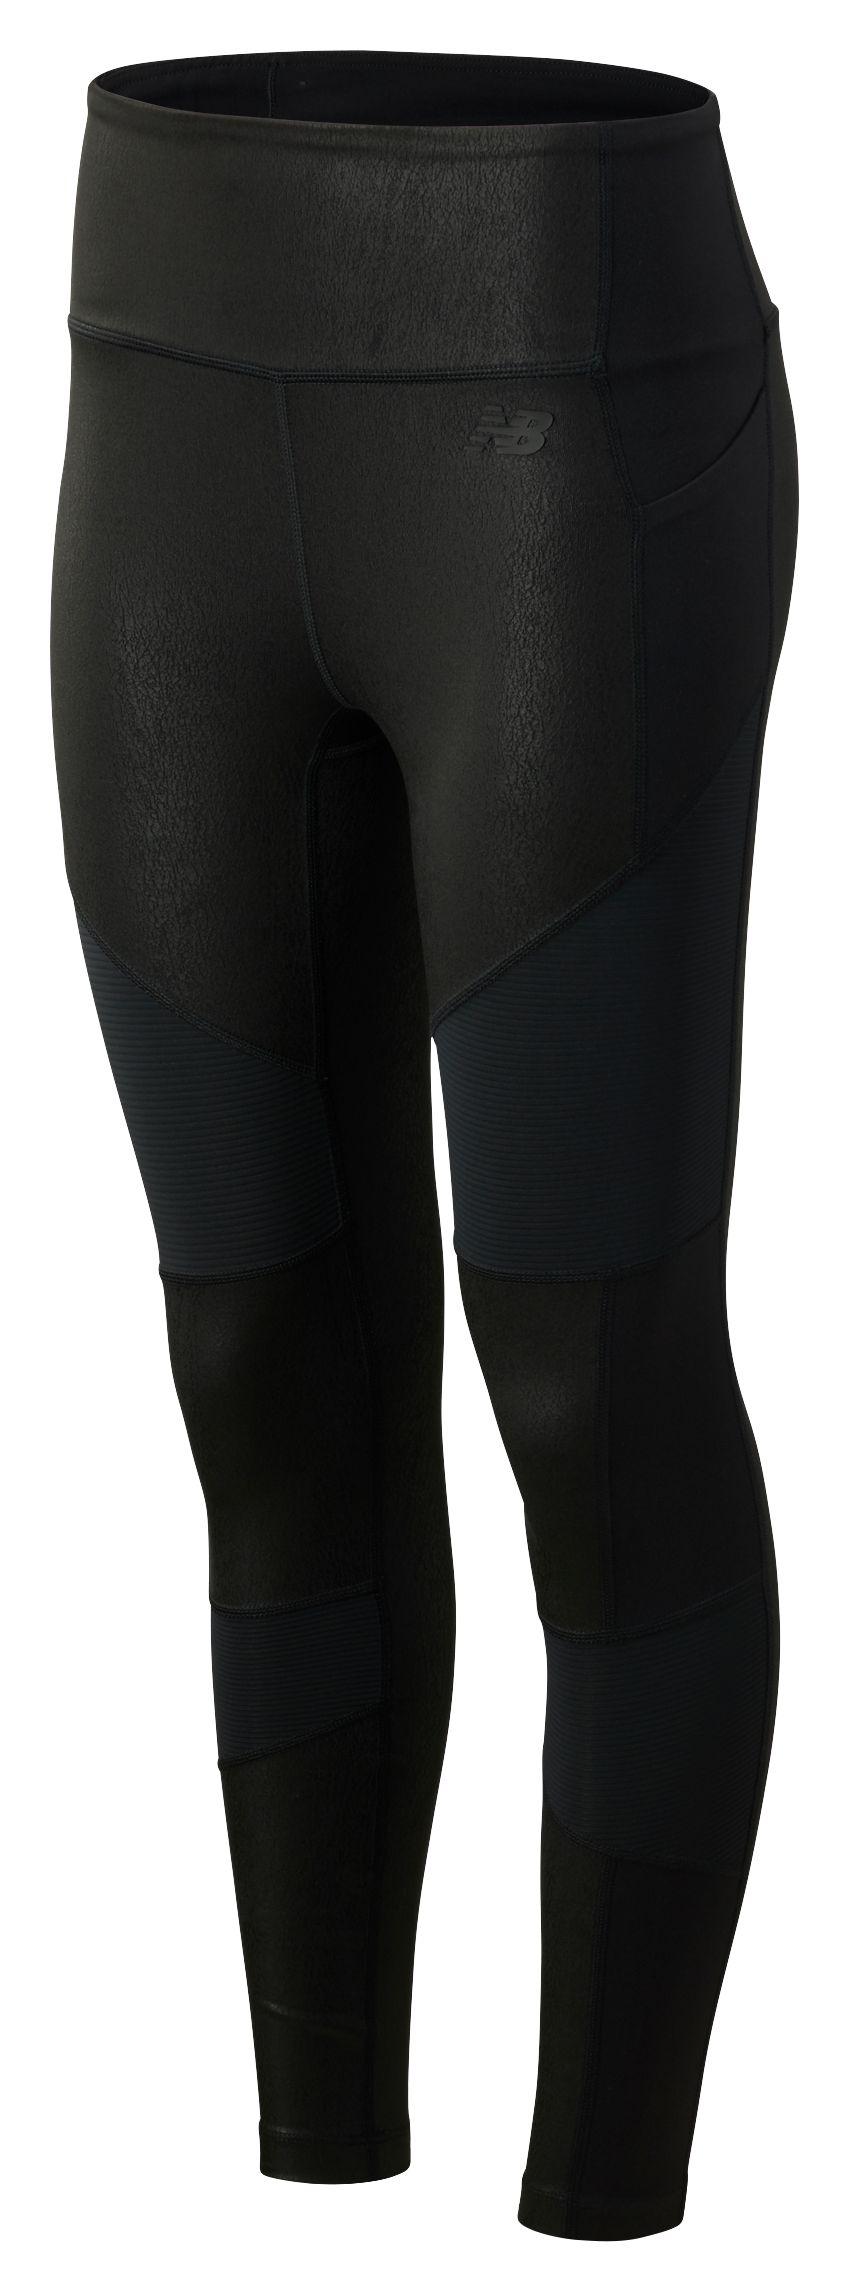 New Balance Women/'s Determination Tight Black